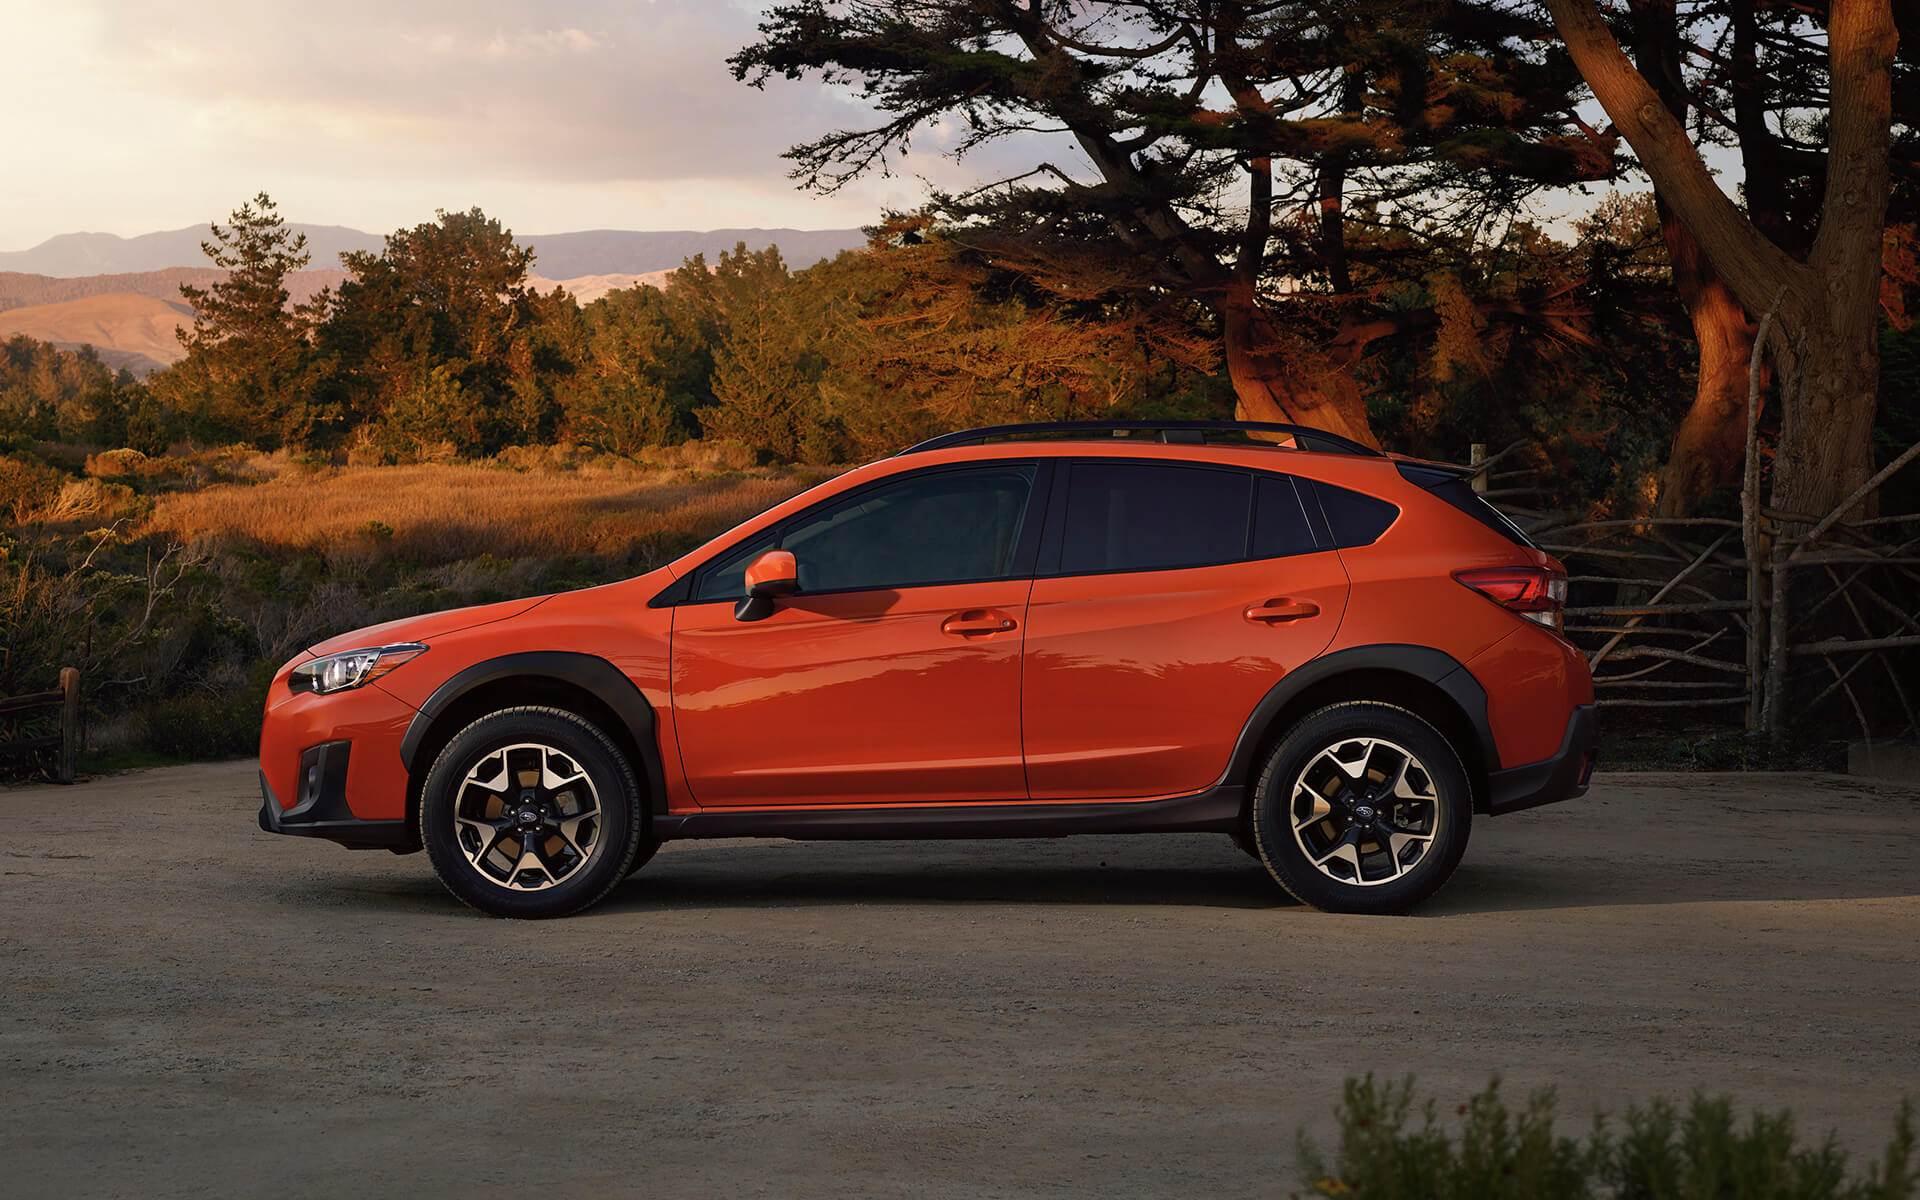 Bright orange Subaru Crosstrek sunset photo